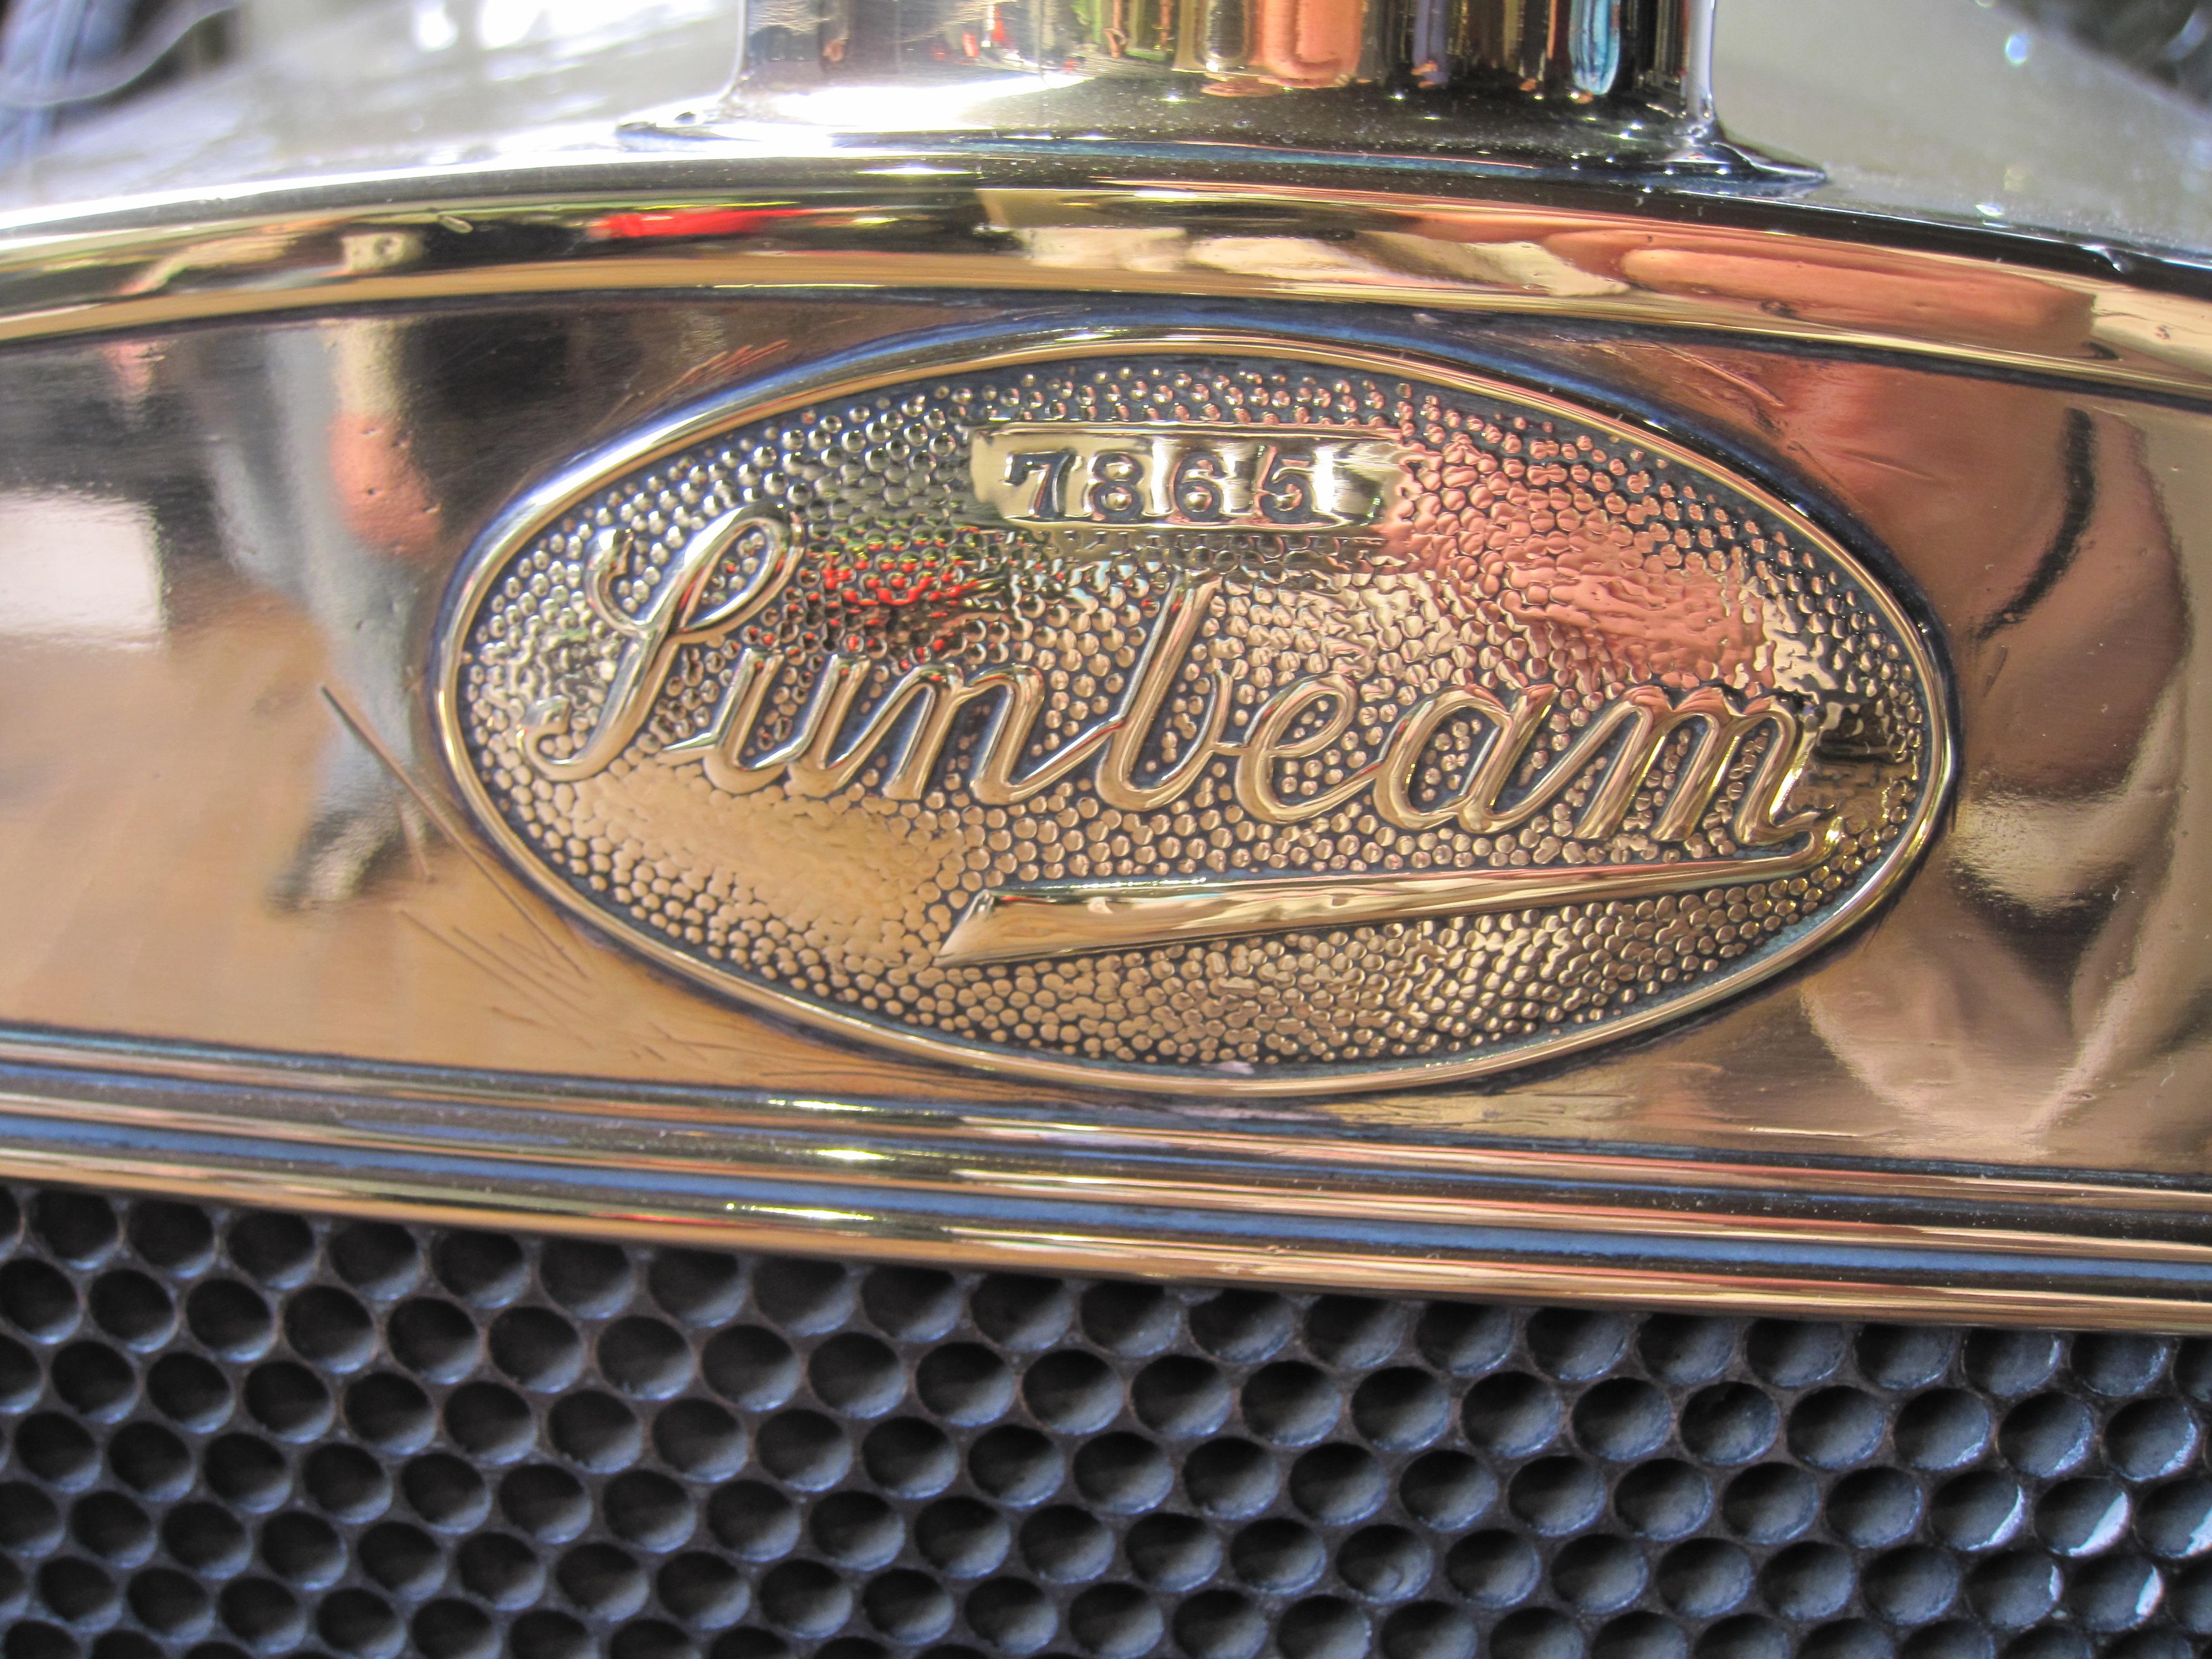 Sunbeam Motor Car Company Wikipedia Switch Location Problem The 1947 Present Chevrolet Gmc Truck